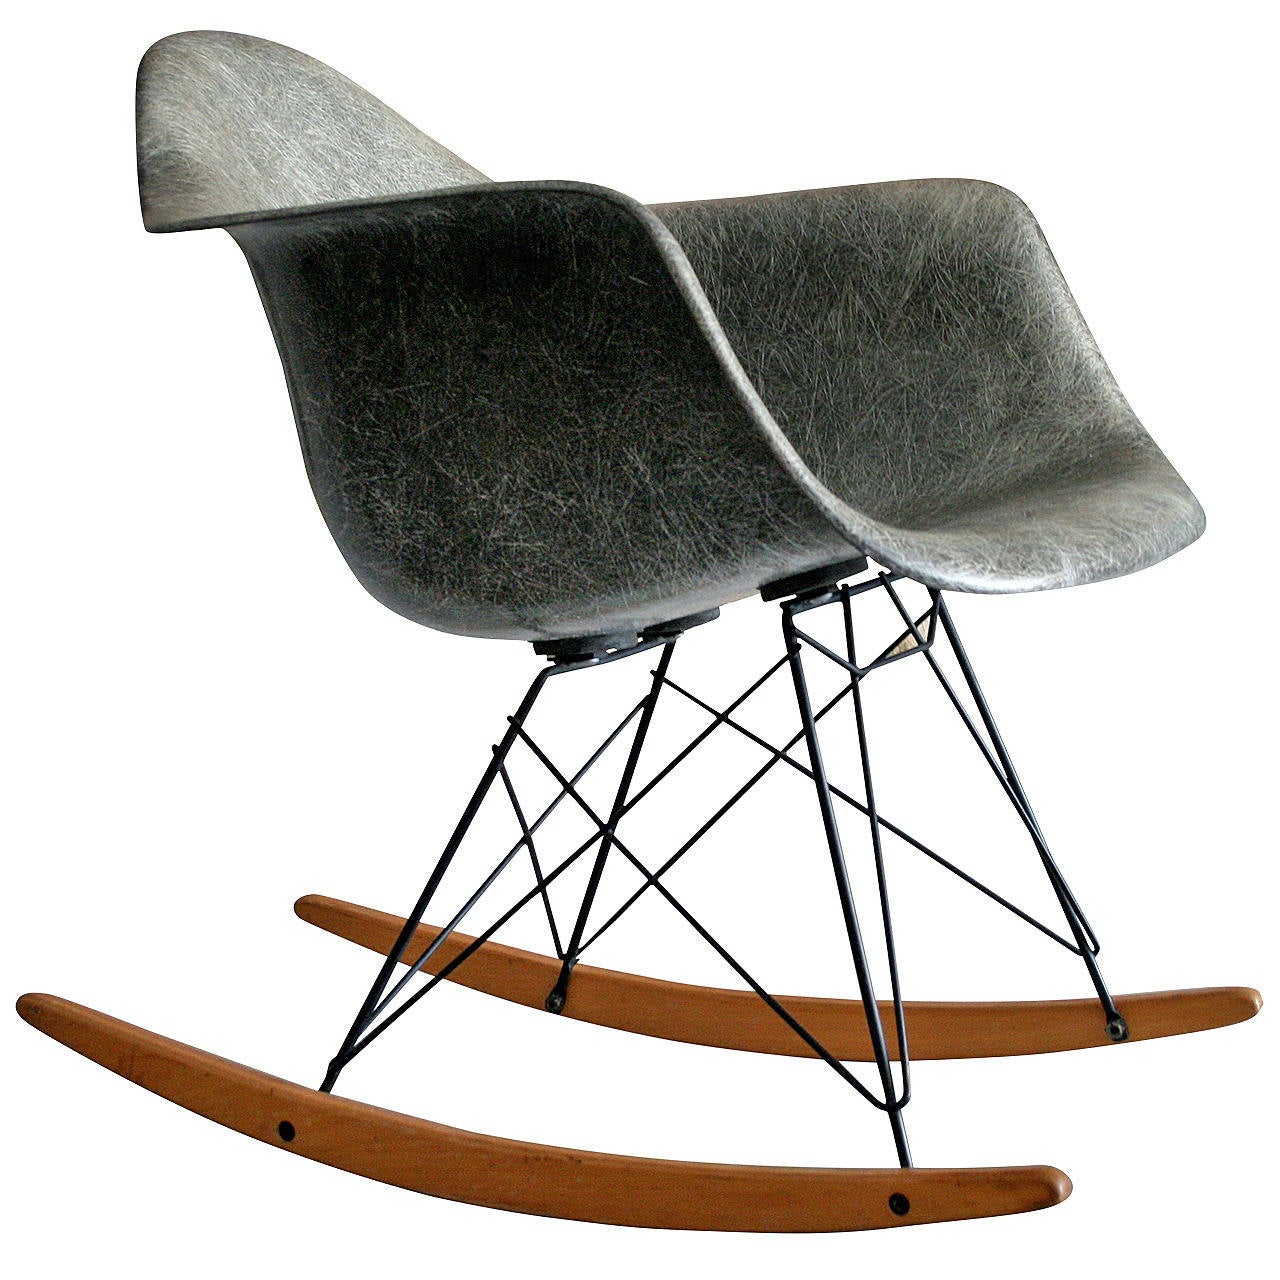 Rar rocking chairs eames style rar rocking arm chair grey - 1950 S Eames Zenith Rar Elepnat Hide Grey Rocker 1